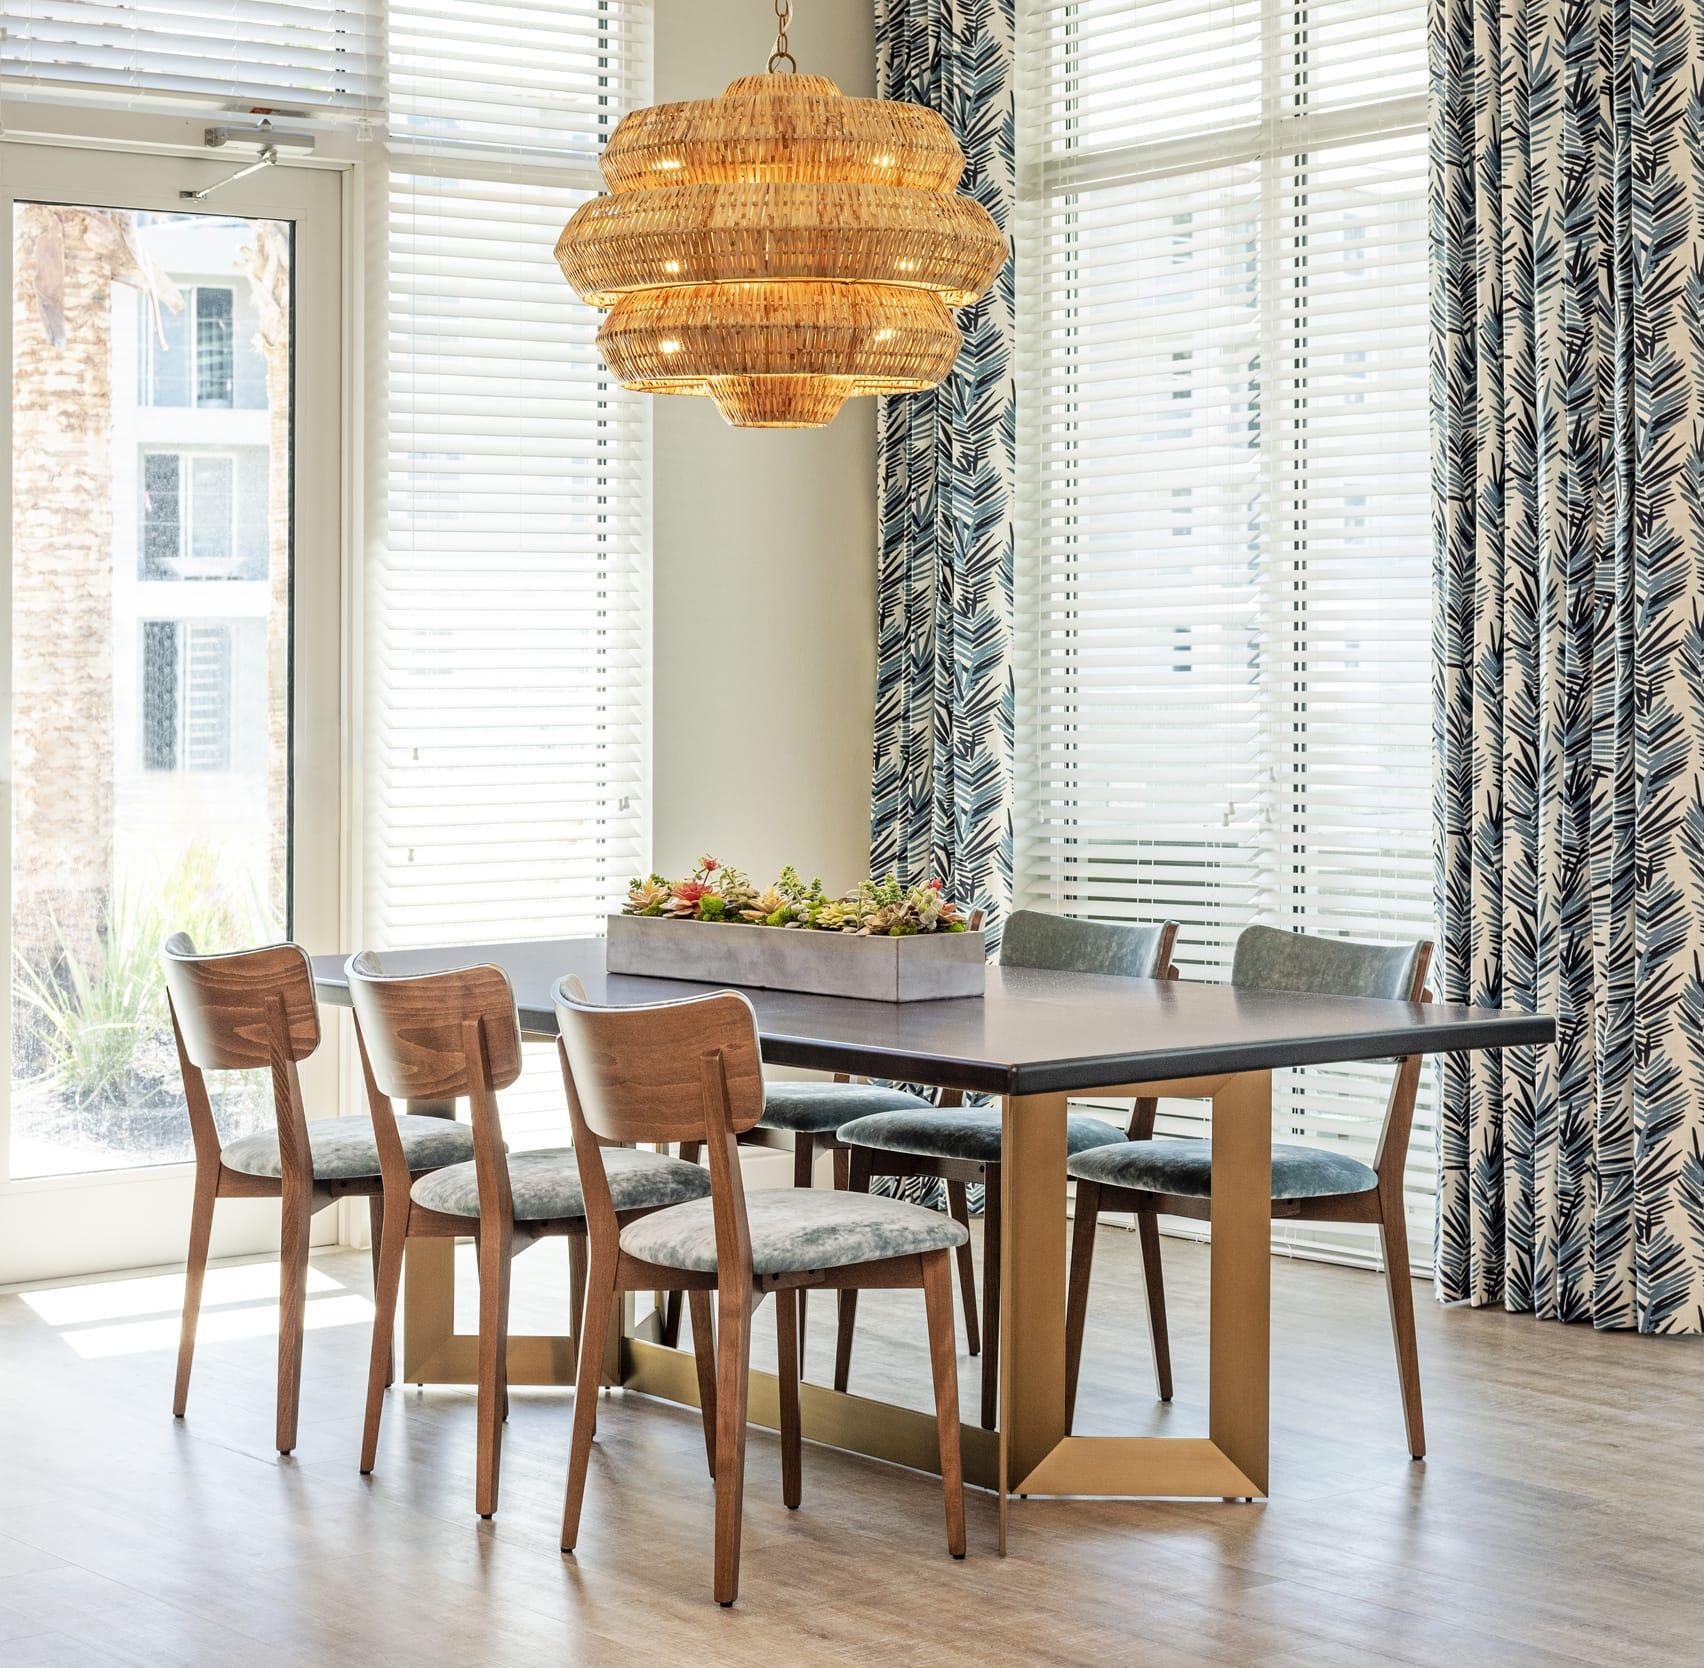 Studio121 Savona Club House Dinning Table Wicker Light Fixture